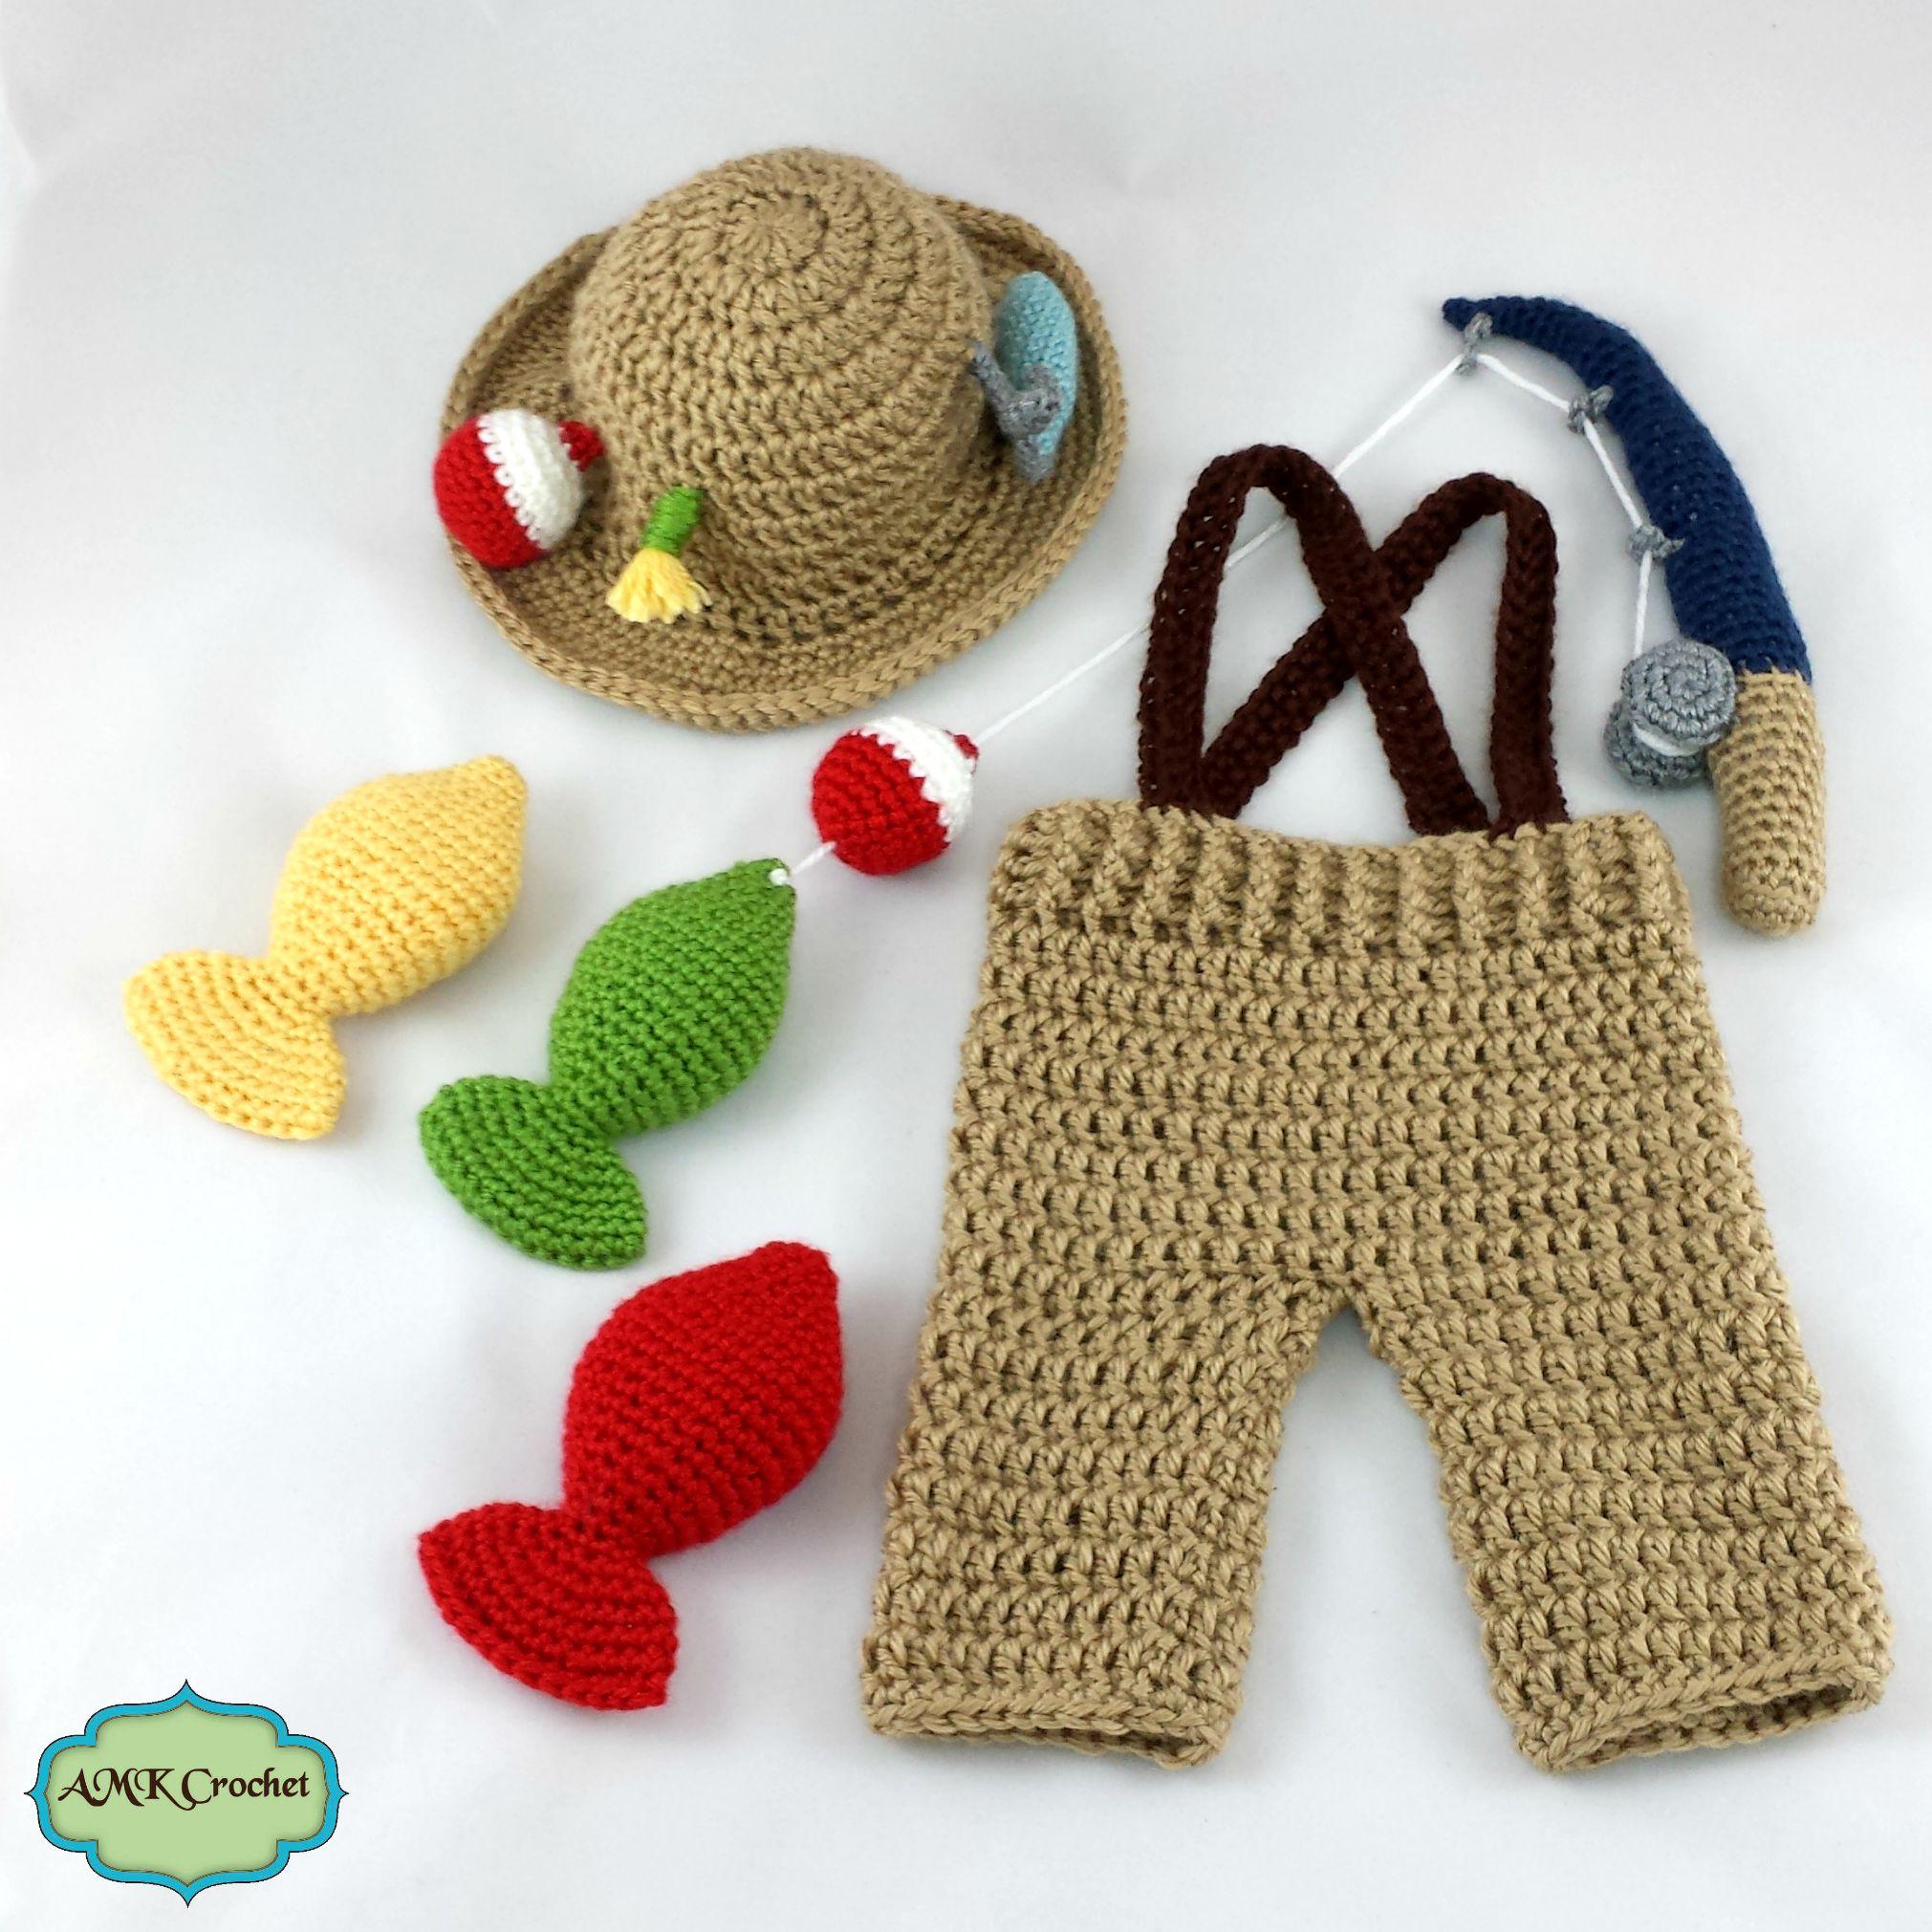 Crochet Newborn Fisherman Outfit Pattern Amk Crochet